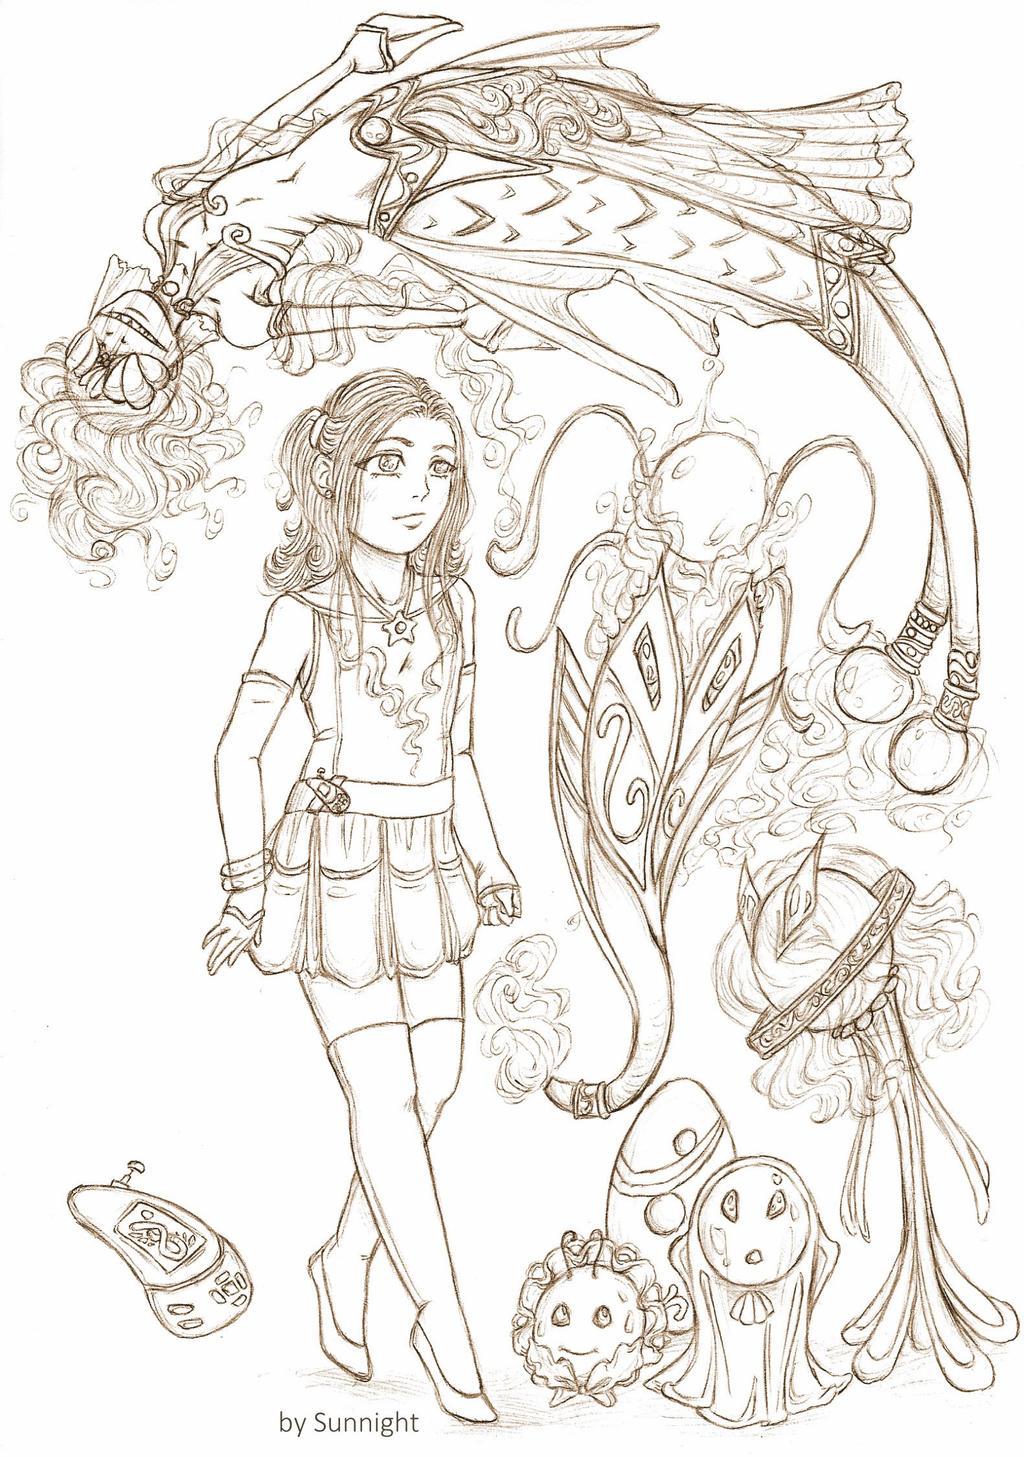 Sarah Snow with their Digimon Maraquelmon by sunnight1